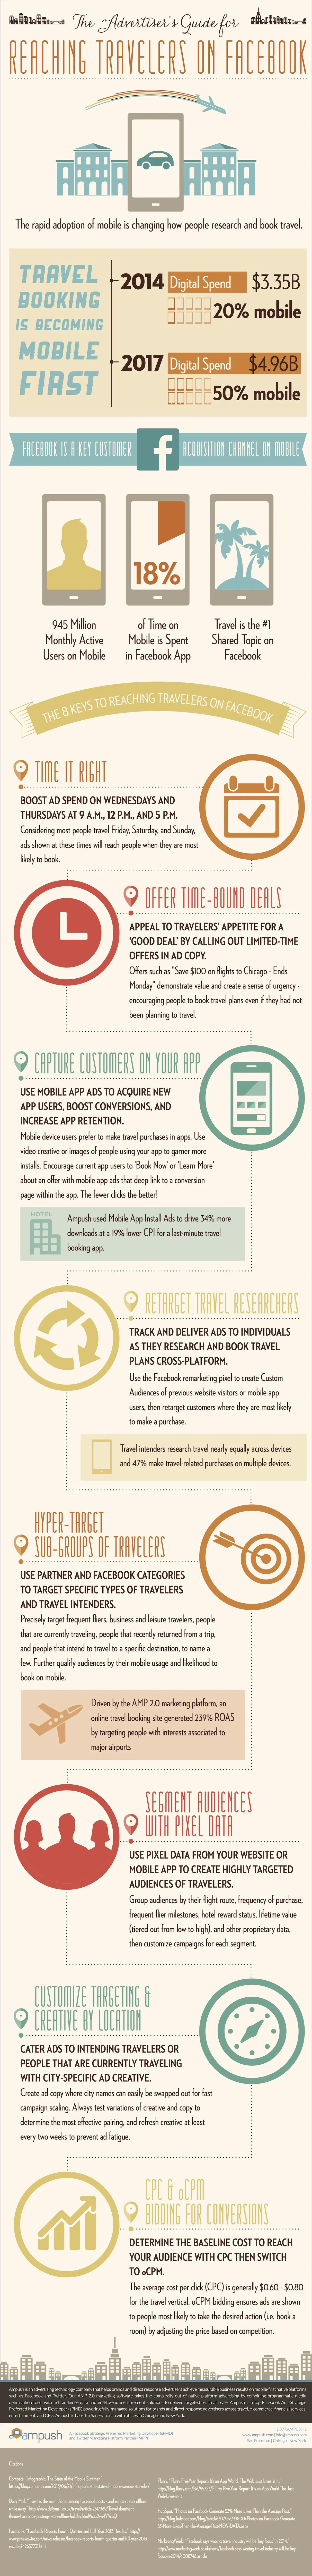 wersm_infographic_facebook_travellers